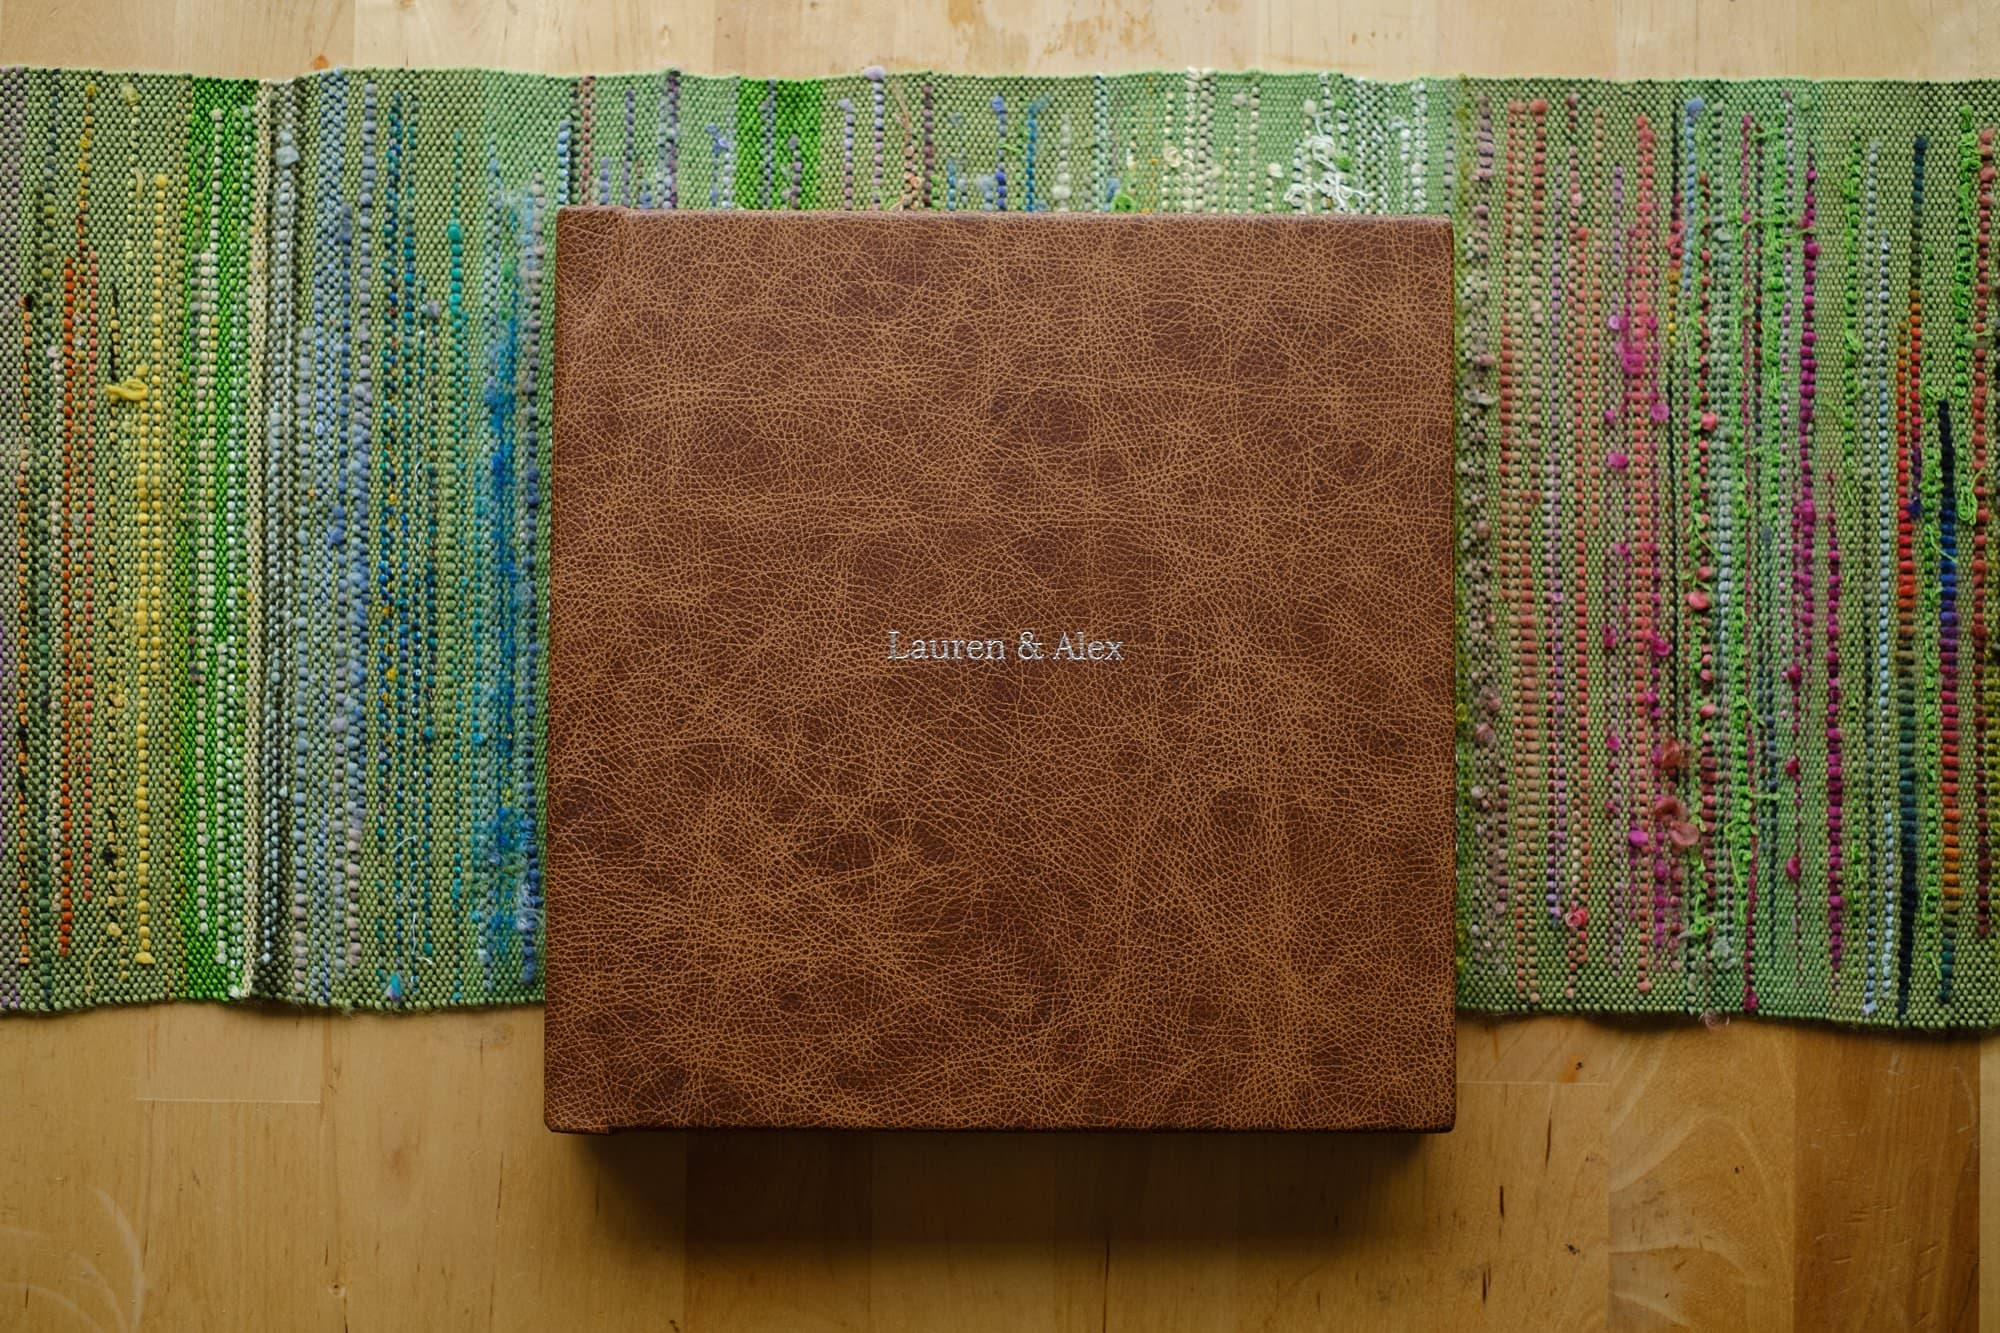 Folio Fine Art Wedding LandA 028 - For Couples | A beautiful wedding album from Folio Albums